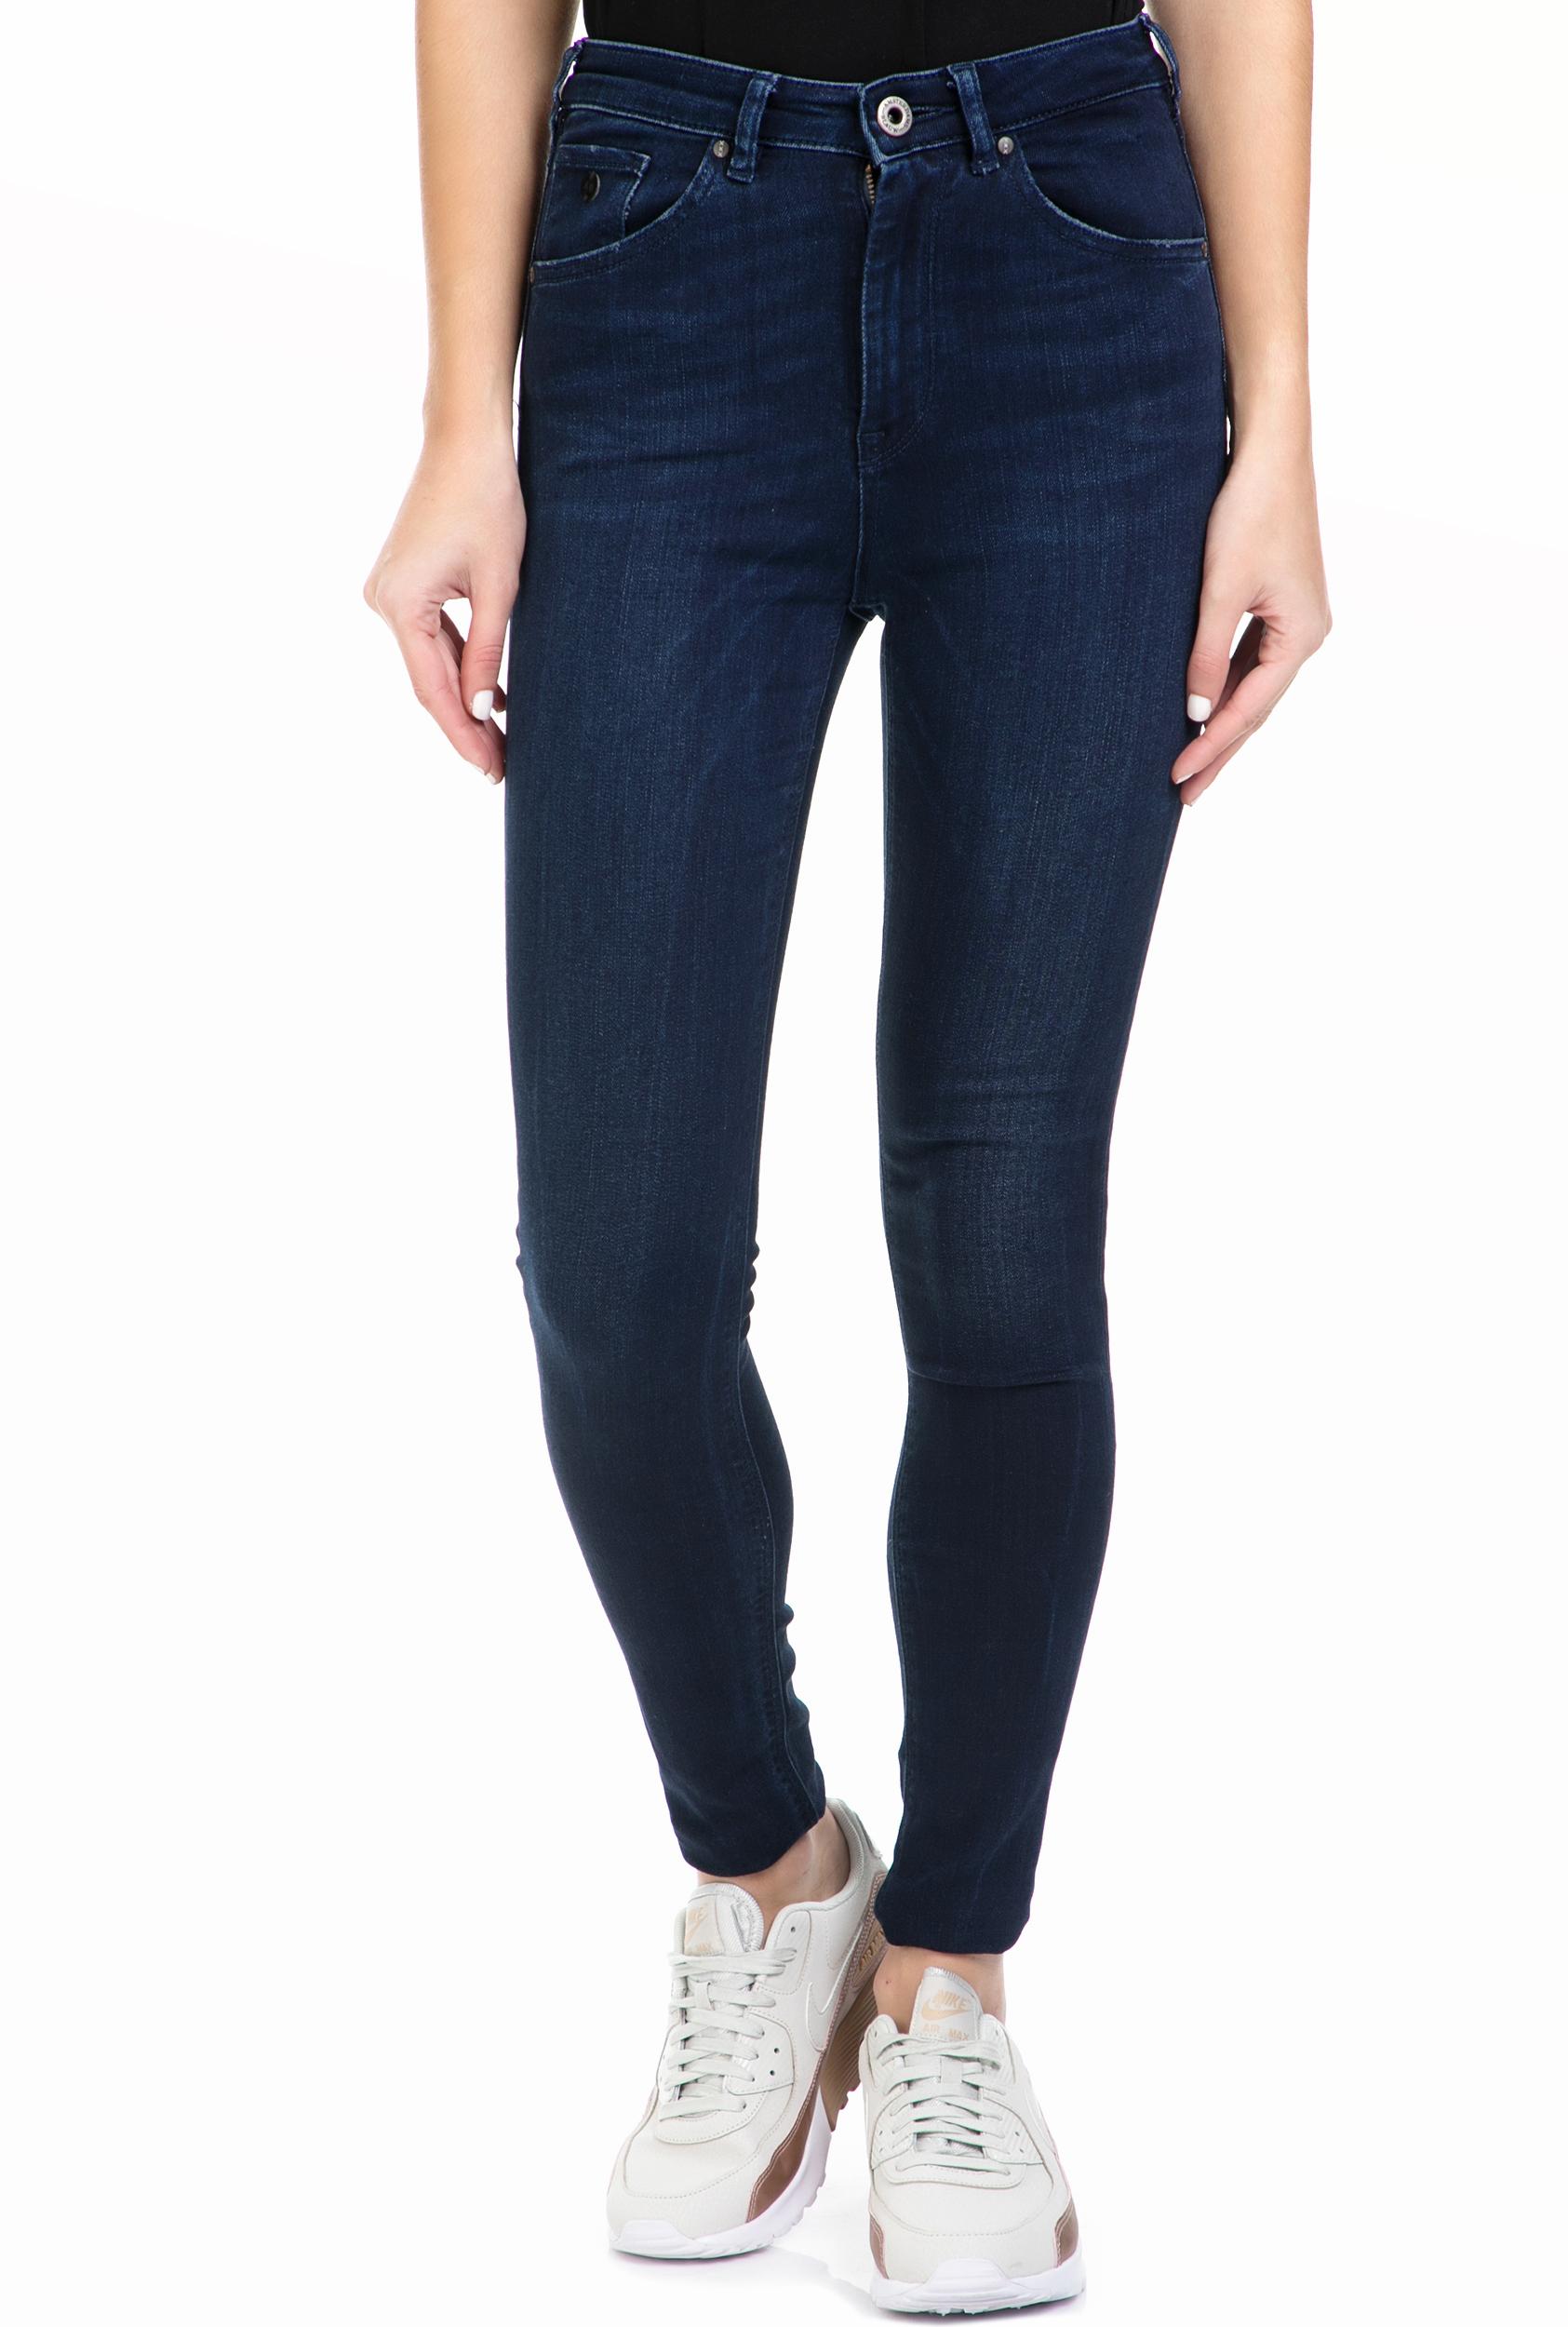 6b369134ab2d SCOTCH   SODA - Γυναικείο τζιν παντελόνι Haut - Precious Night SCOTCH    SODA μπλε